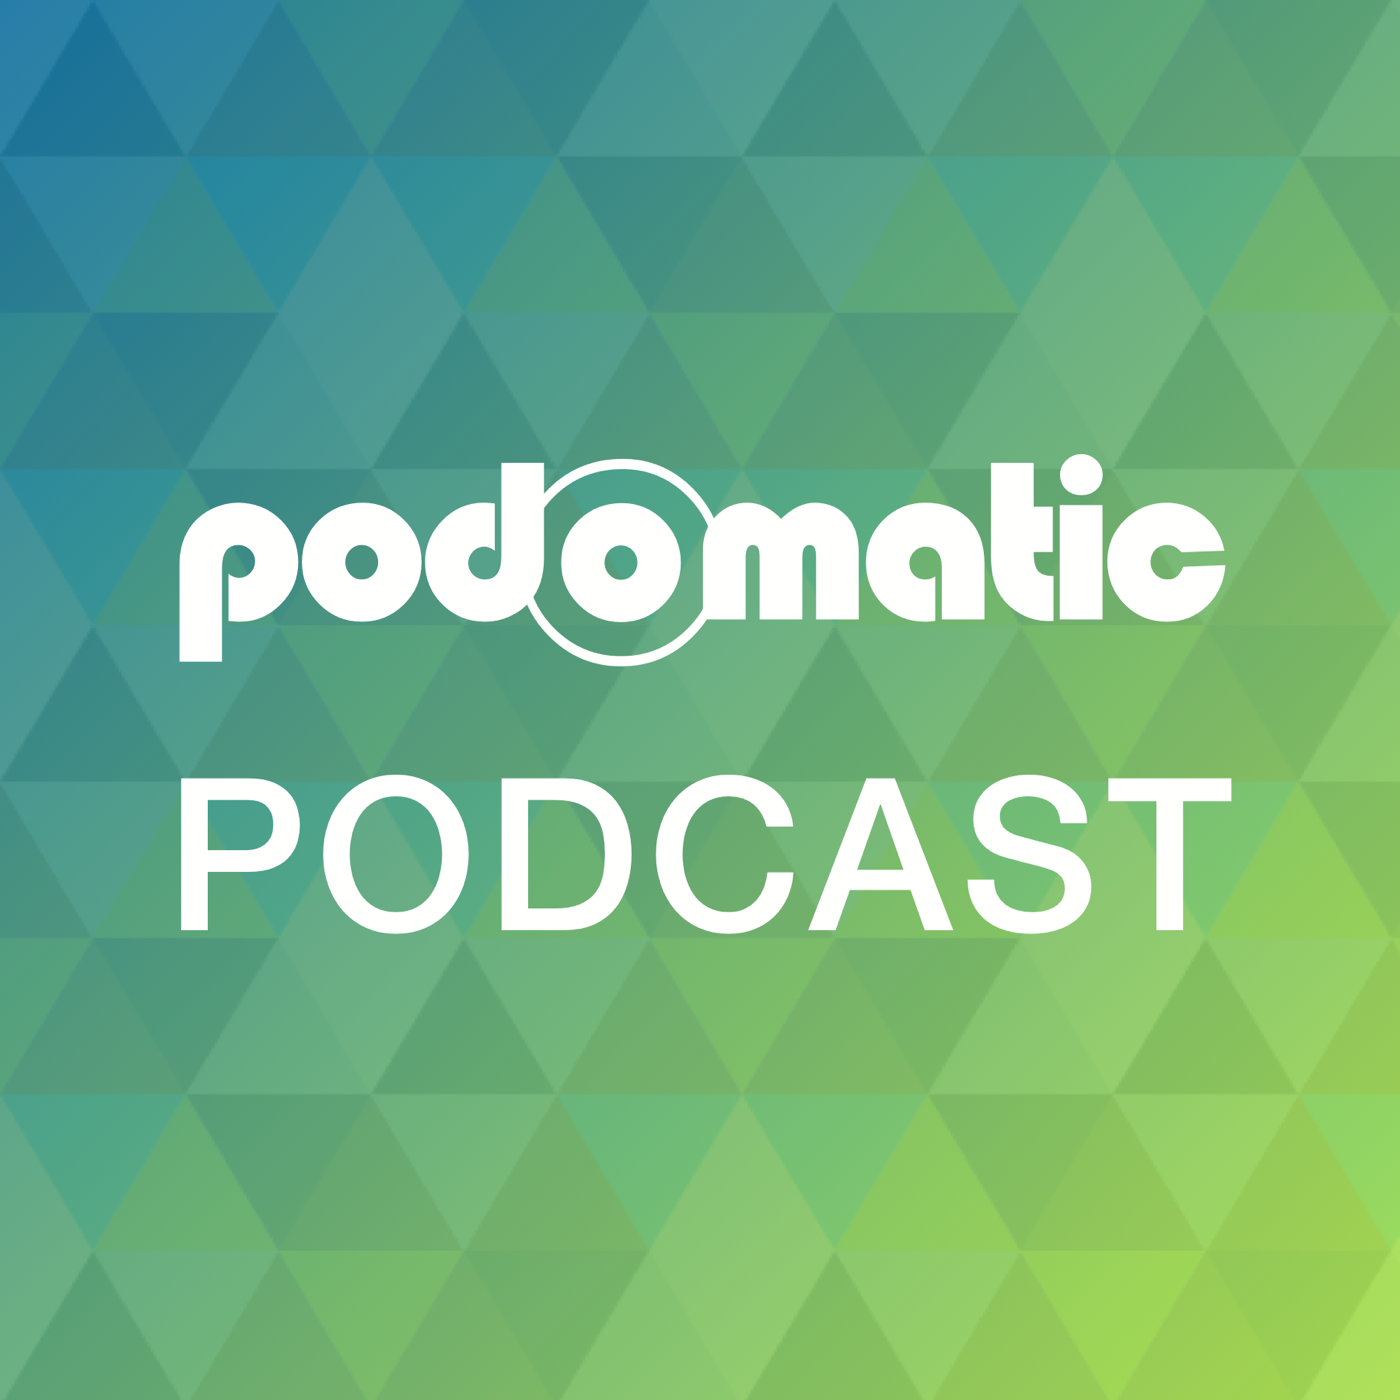 AliReza Ya's Podcast